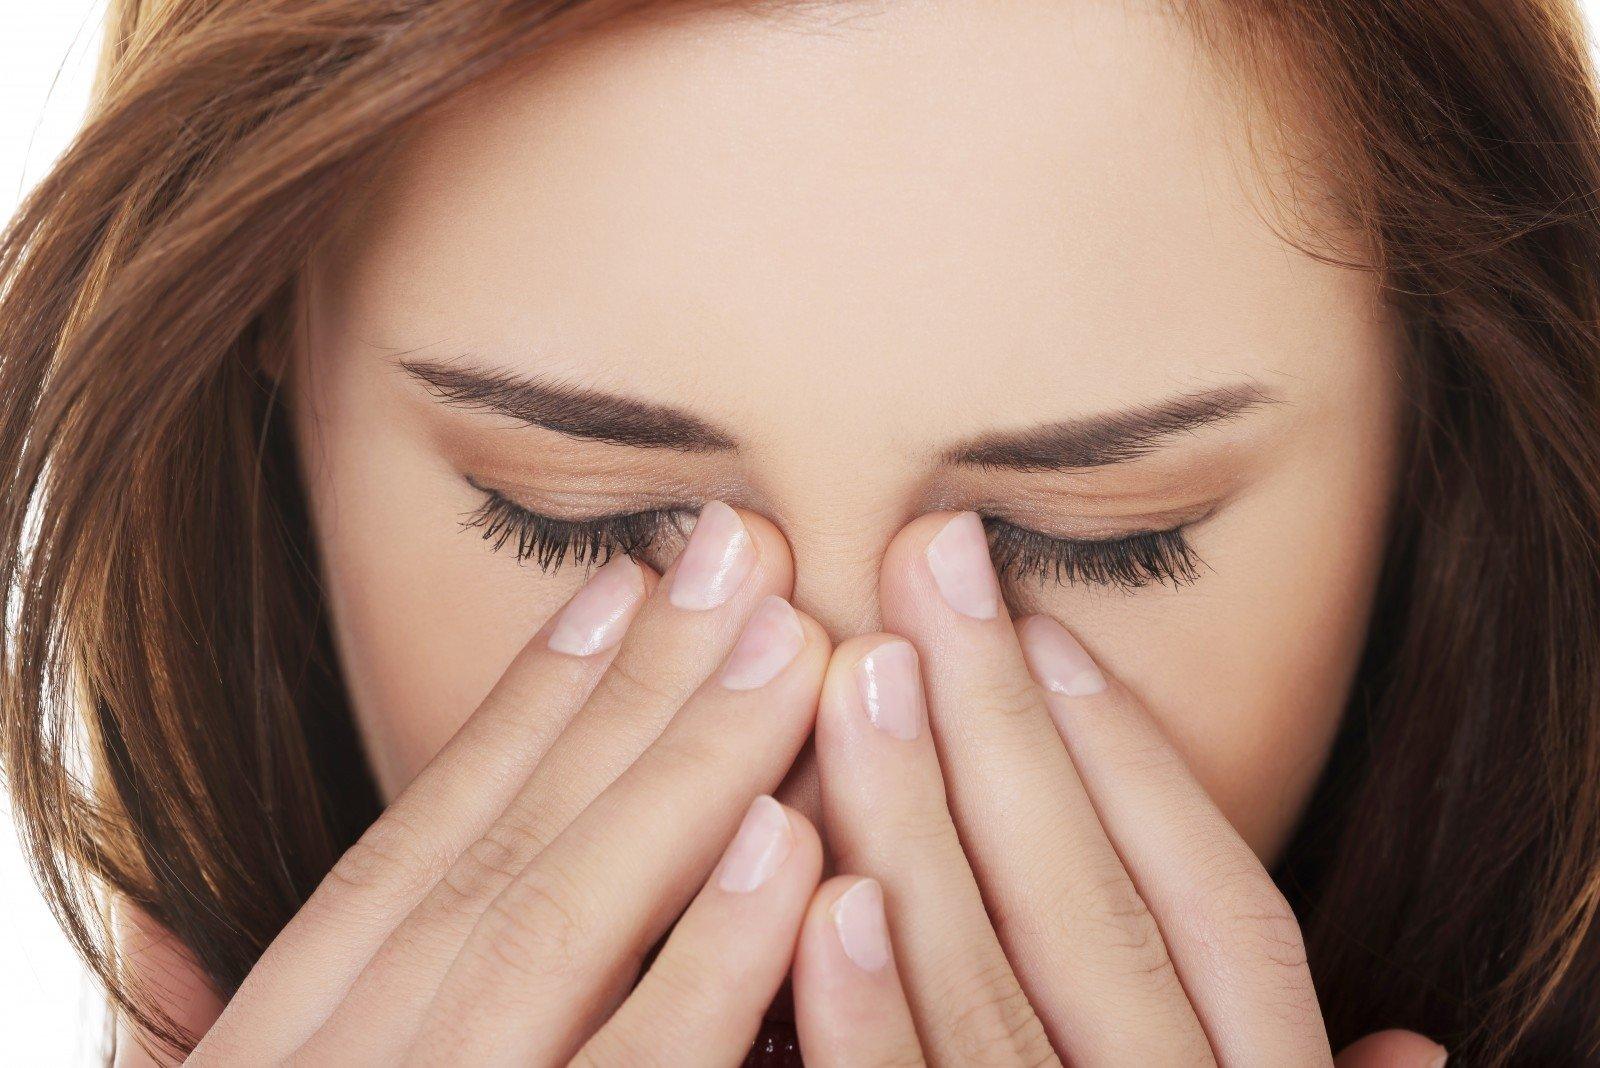 kapiliarai akies hipertenzijoje